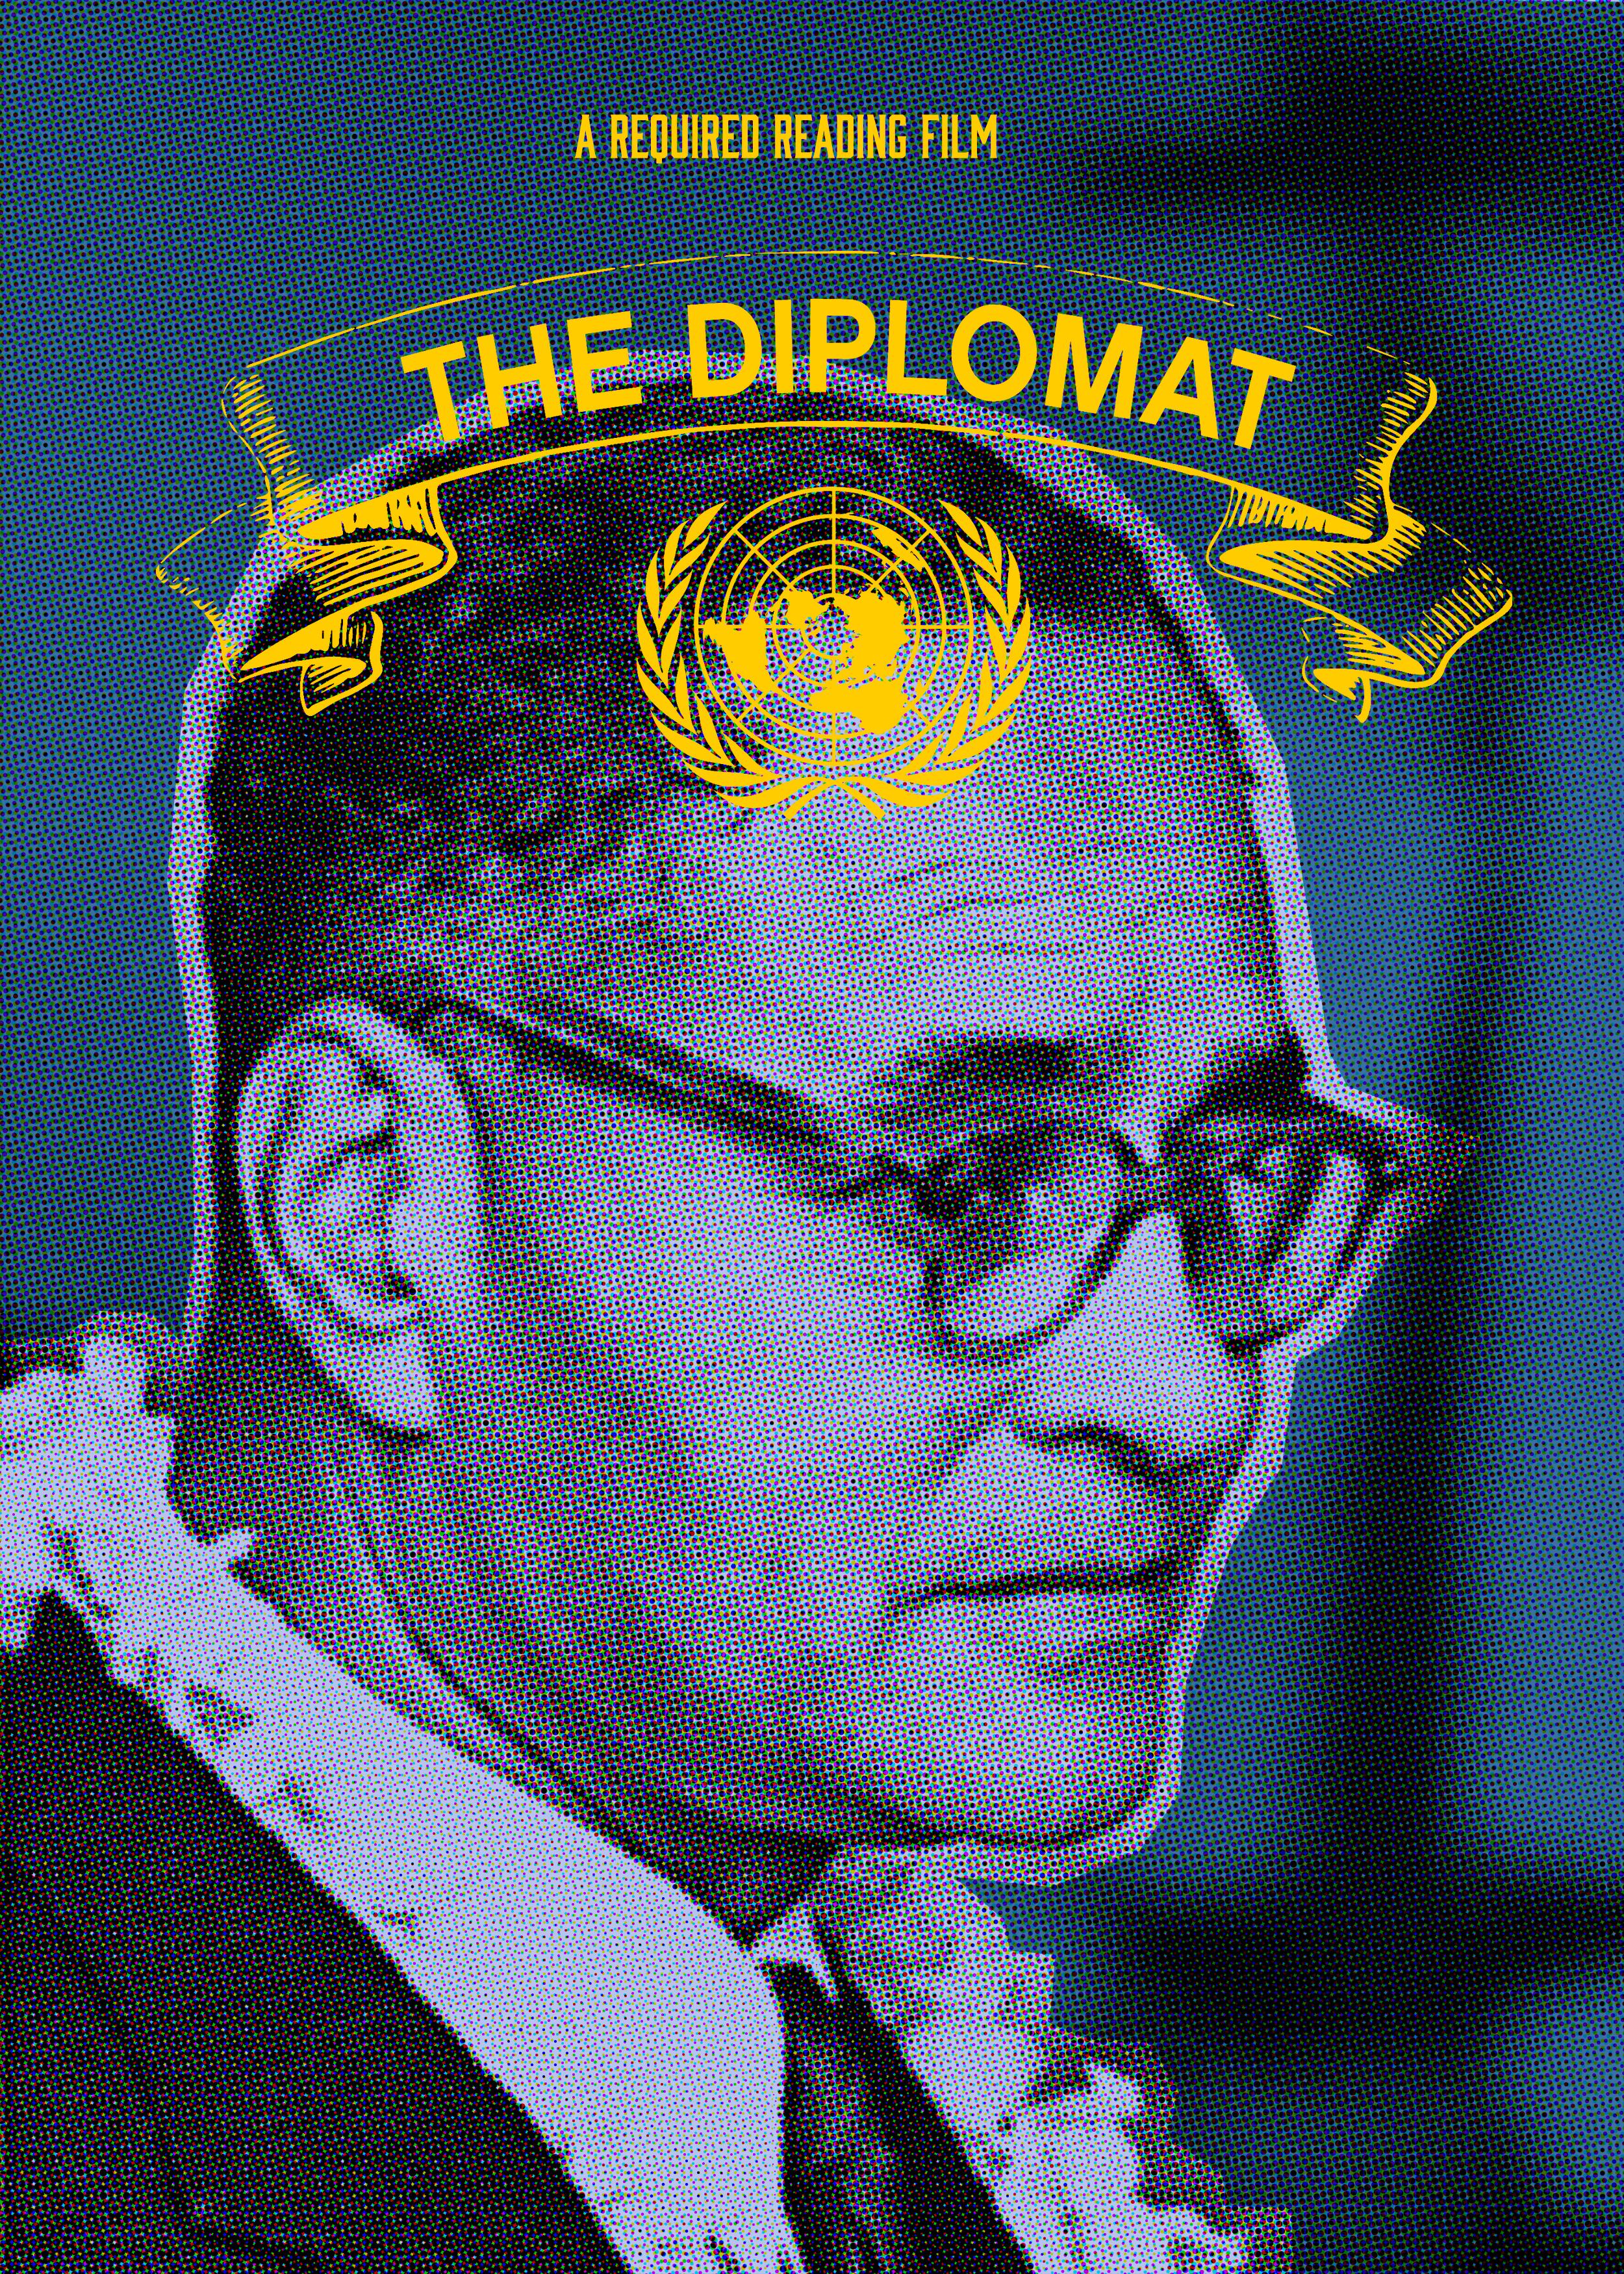 _diplomat_poster.jpg